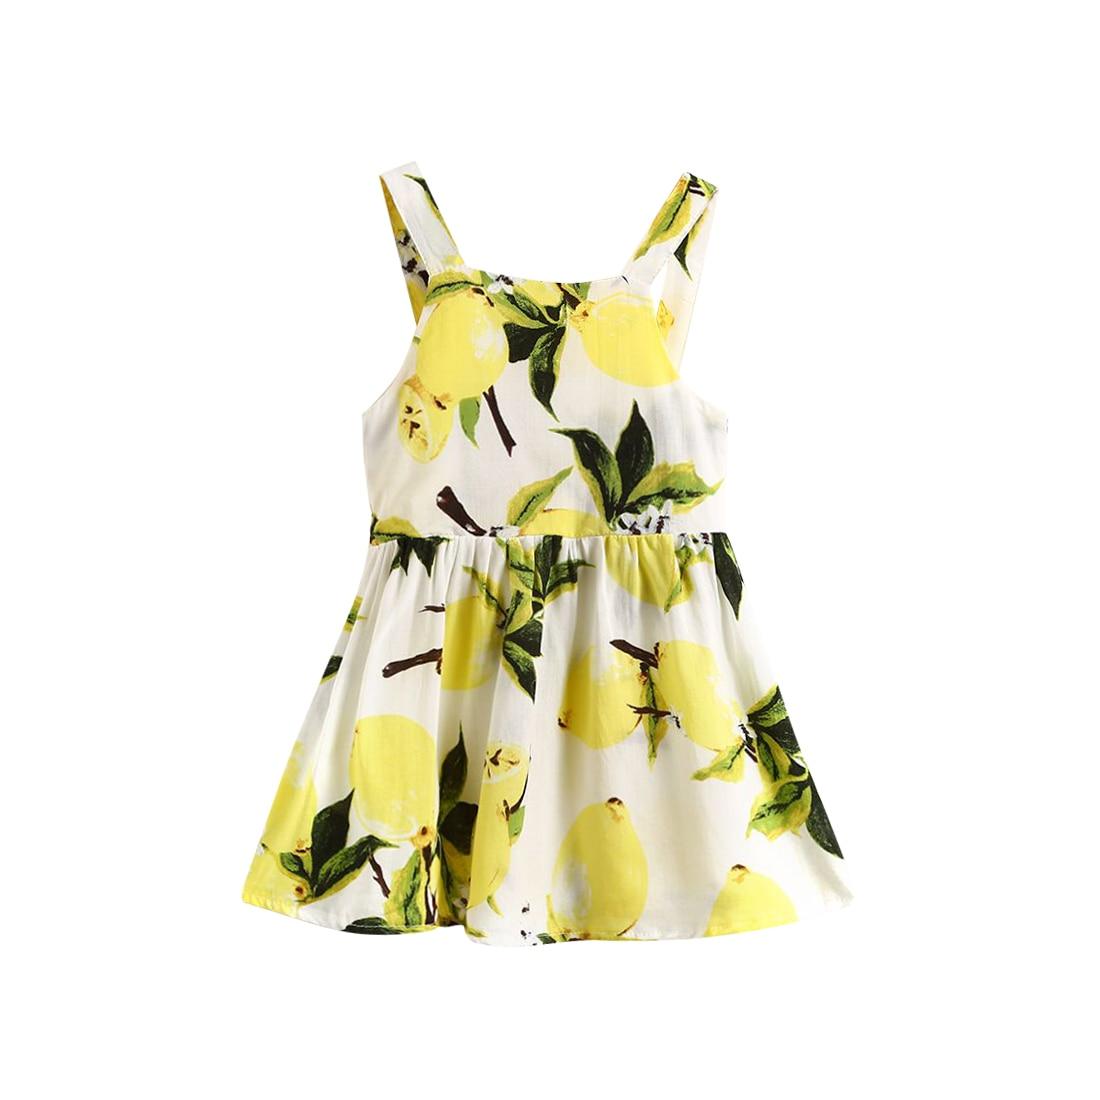 High quality Newborn Baby Kid Girl Sleeveless Sundress Fresh Dress Pageant Party Clothes Tutu Lemon 0-24